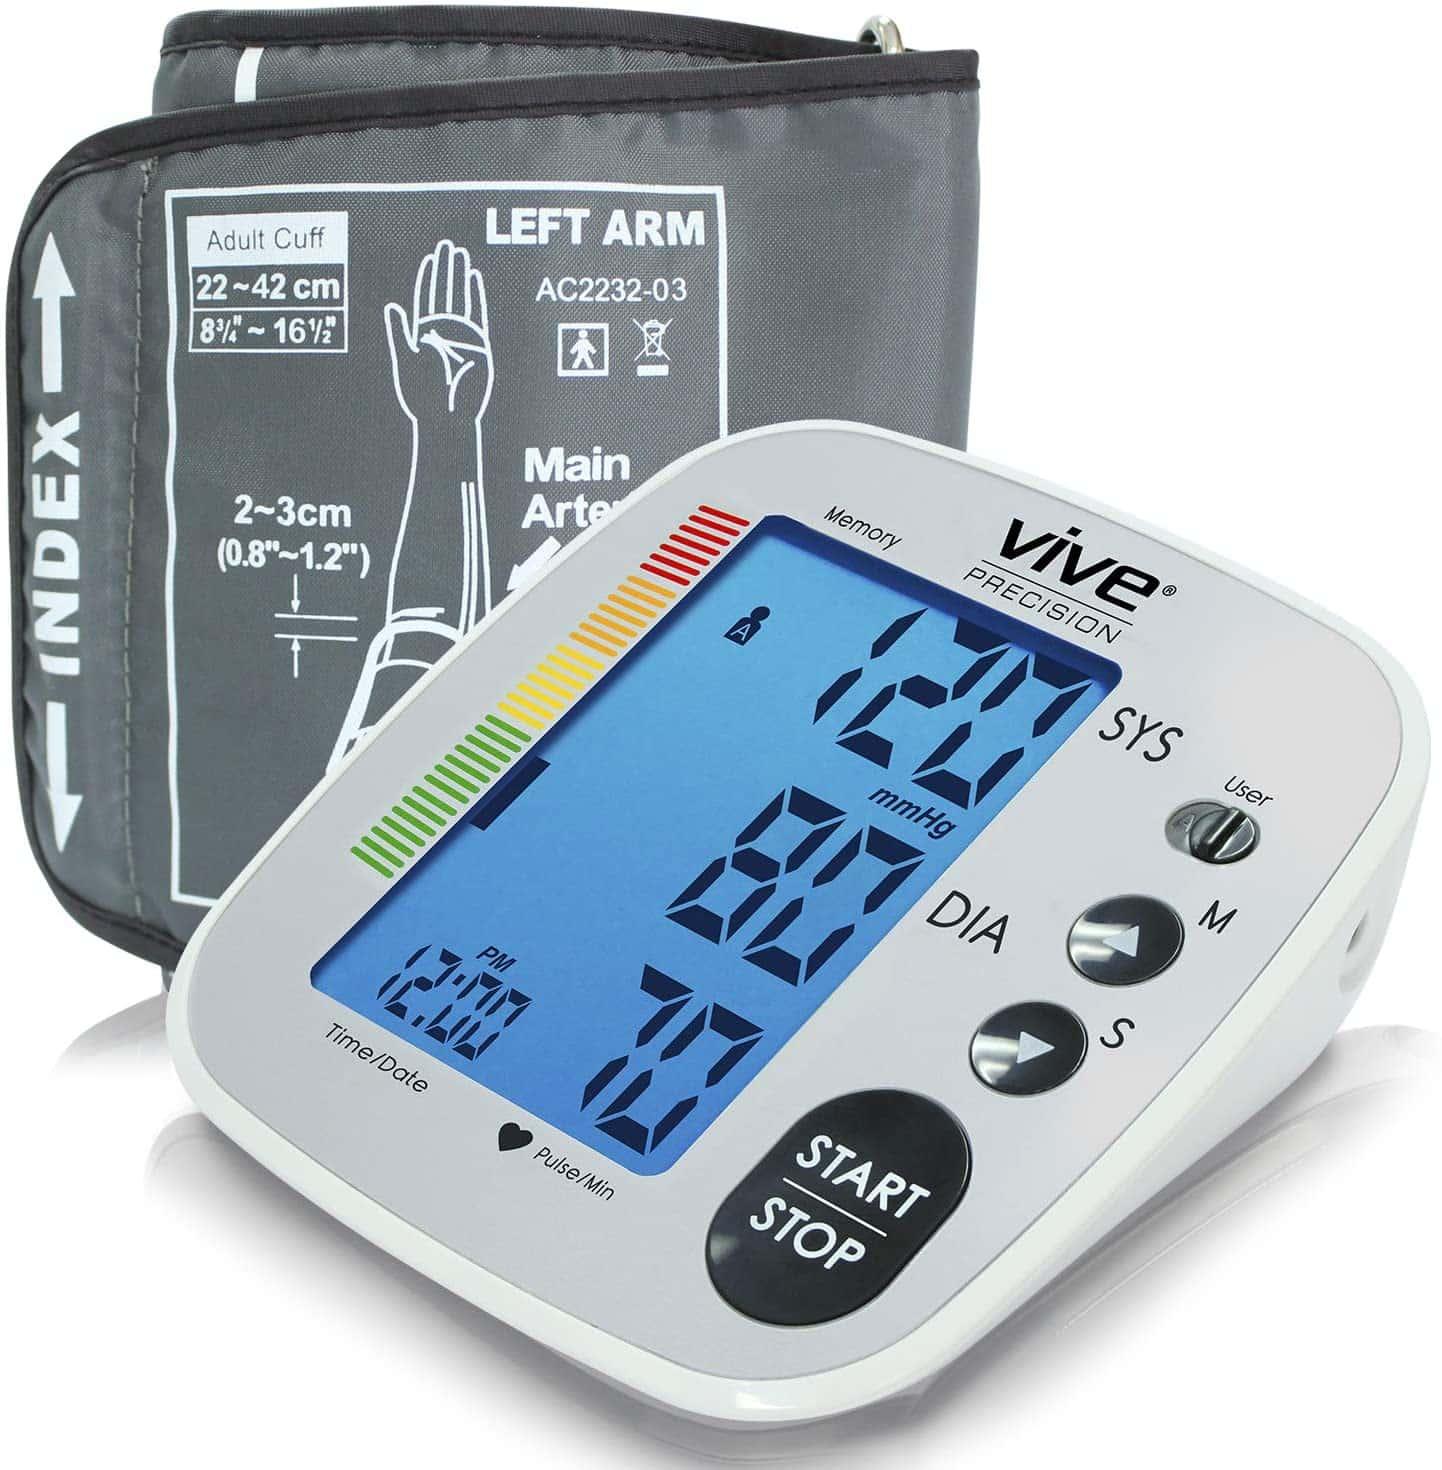 Vive Precision Blood Pressure Cuff Blood Pressure Monitor